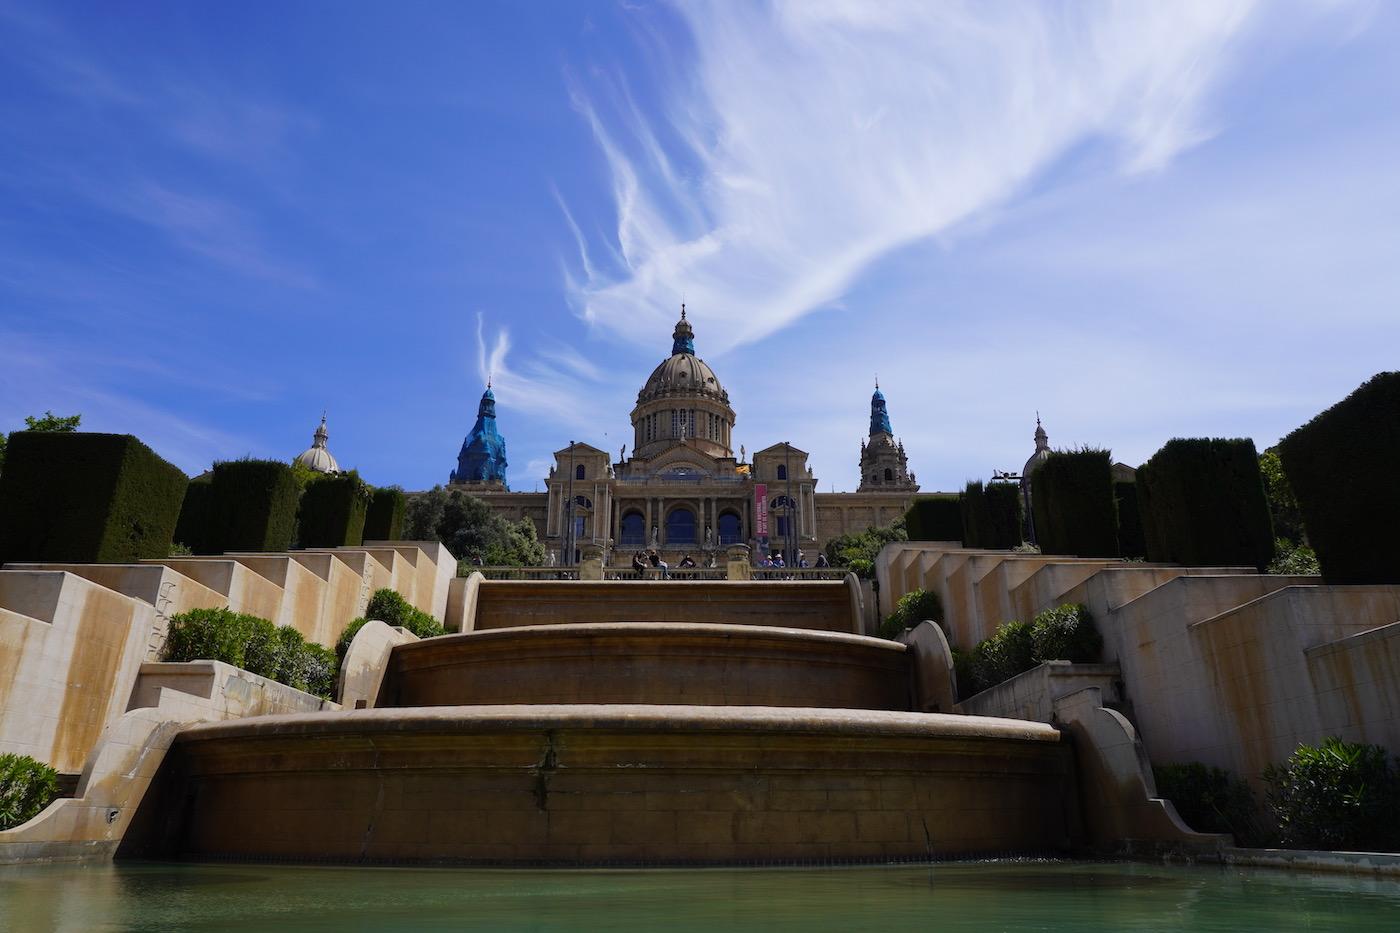 quoi visiter à Barcelone